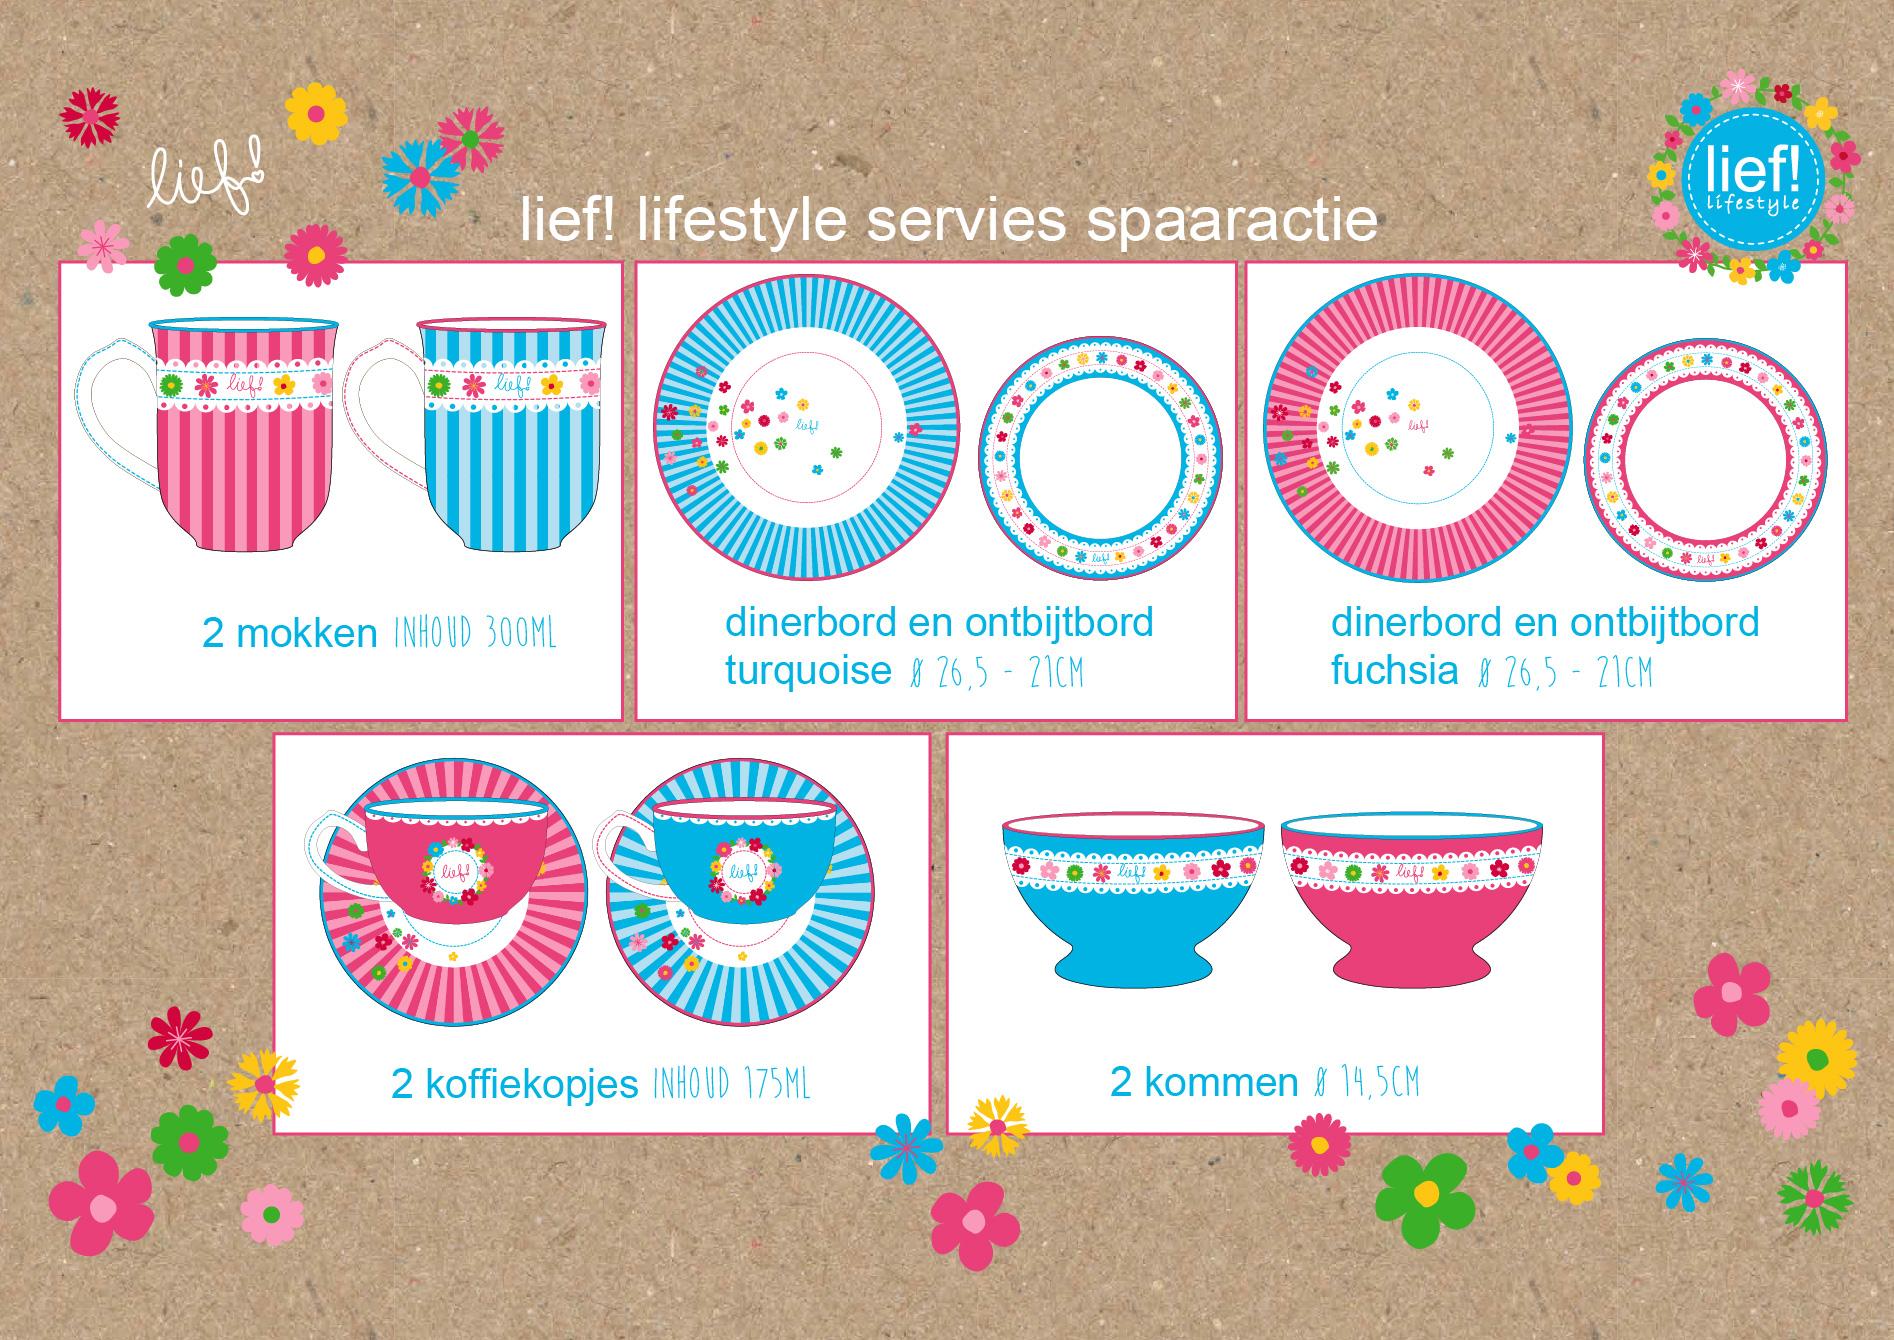 servies-overview-lief!-lifestyle